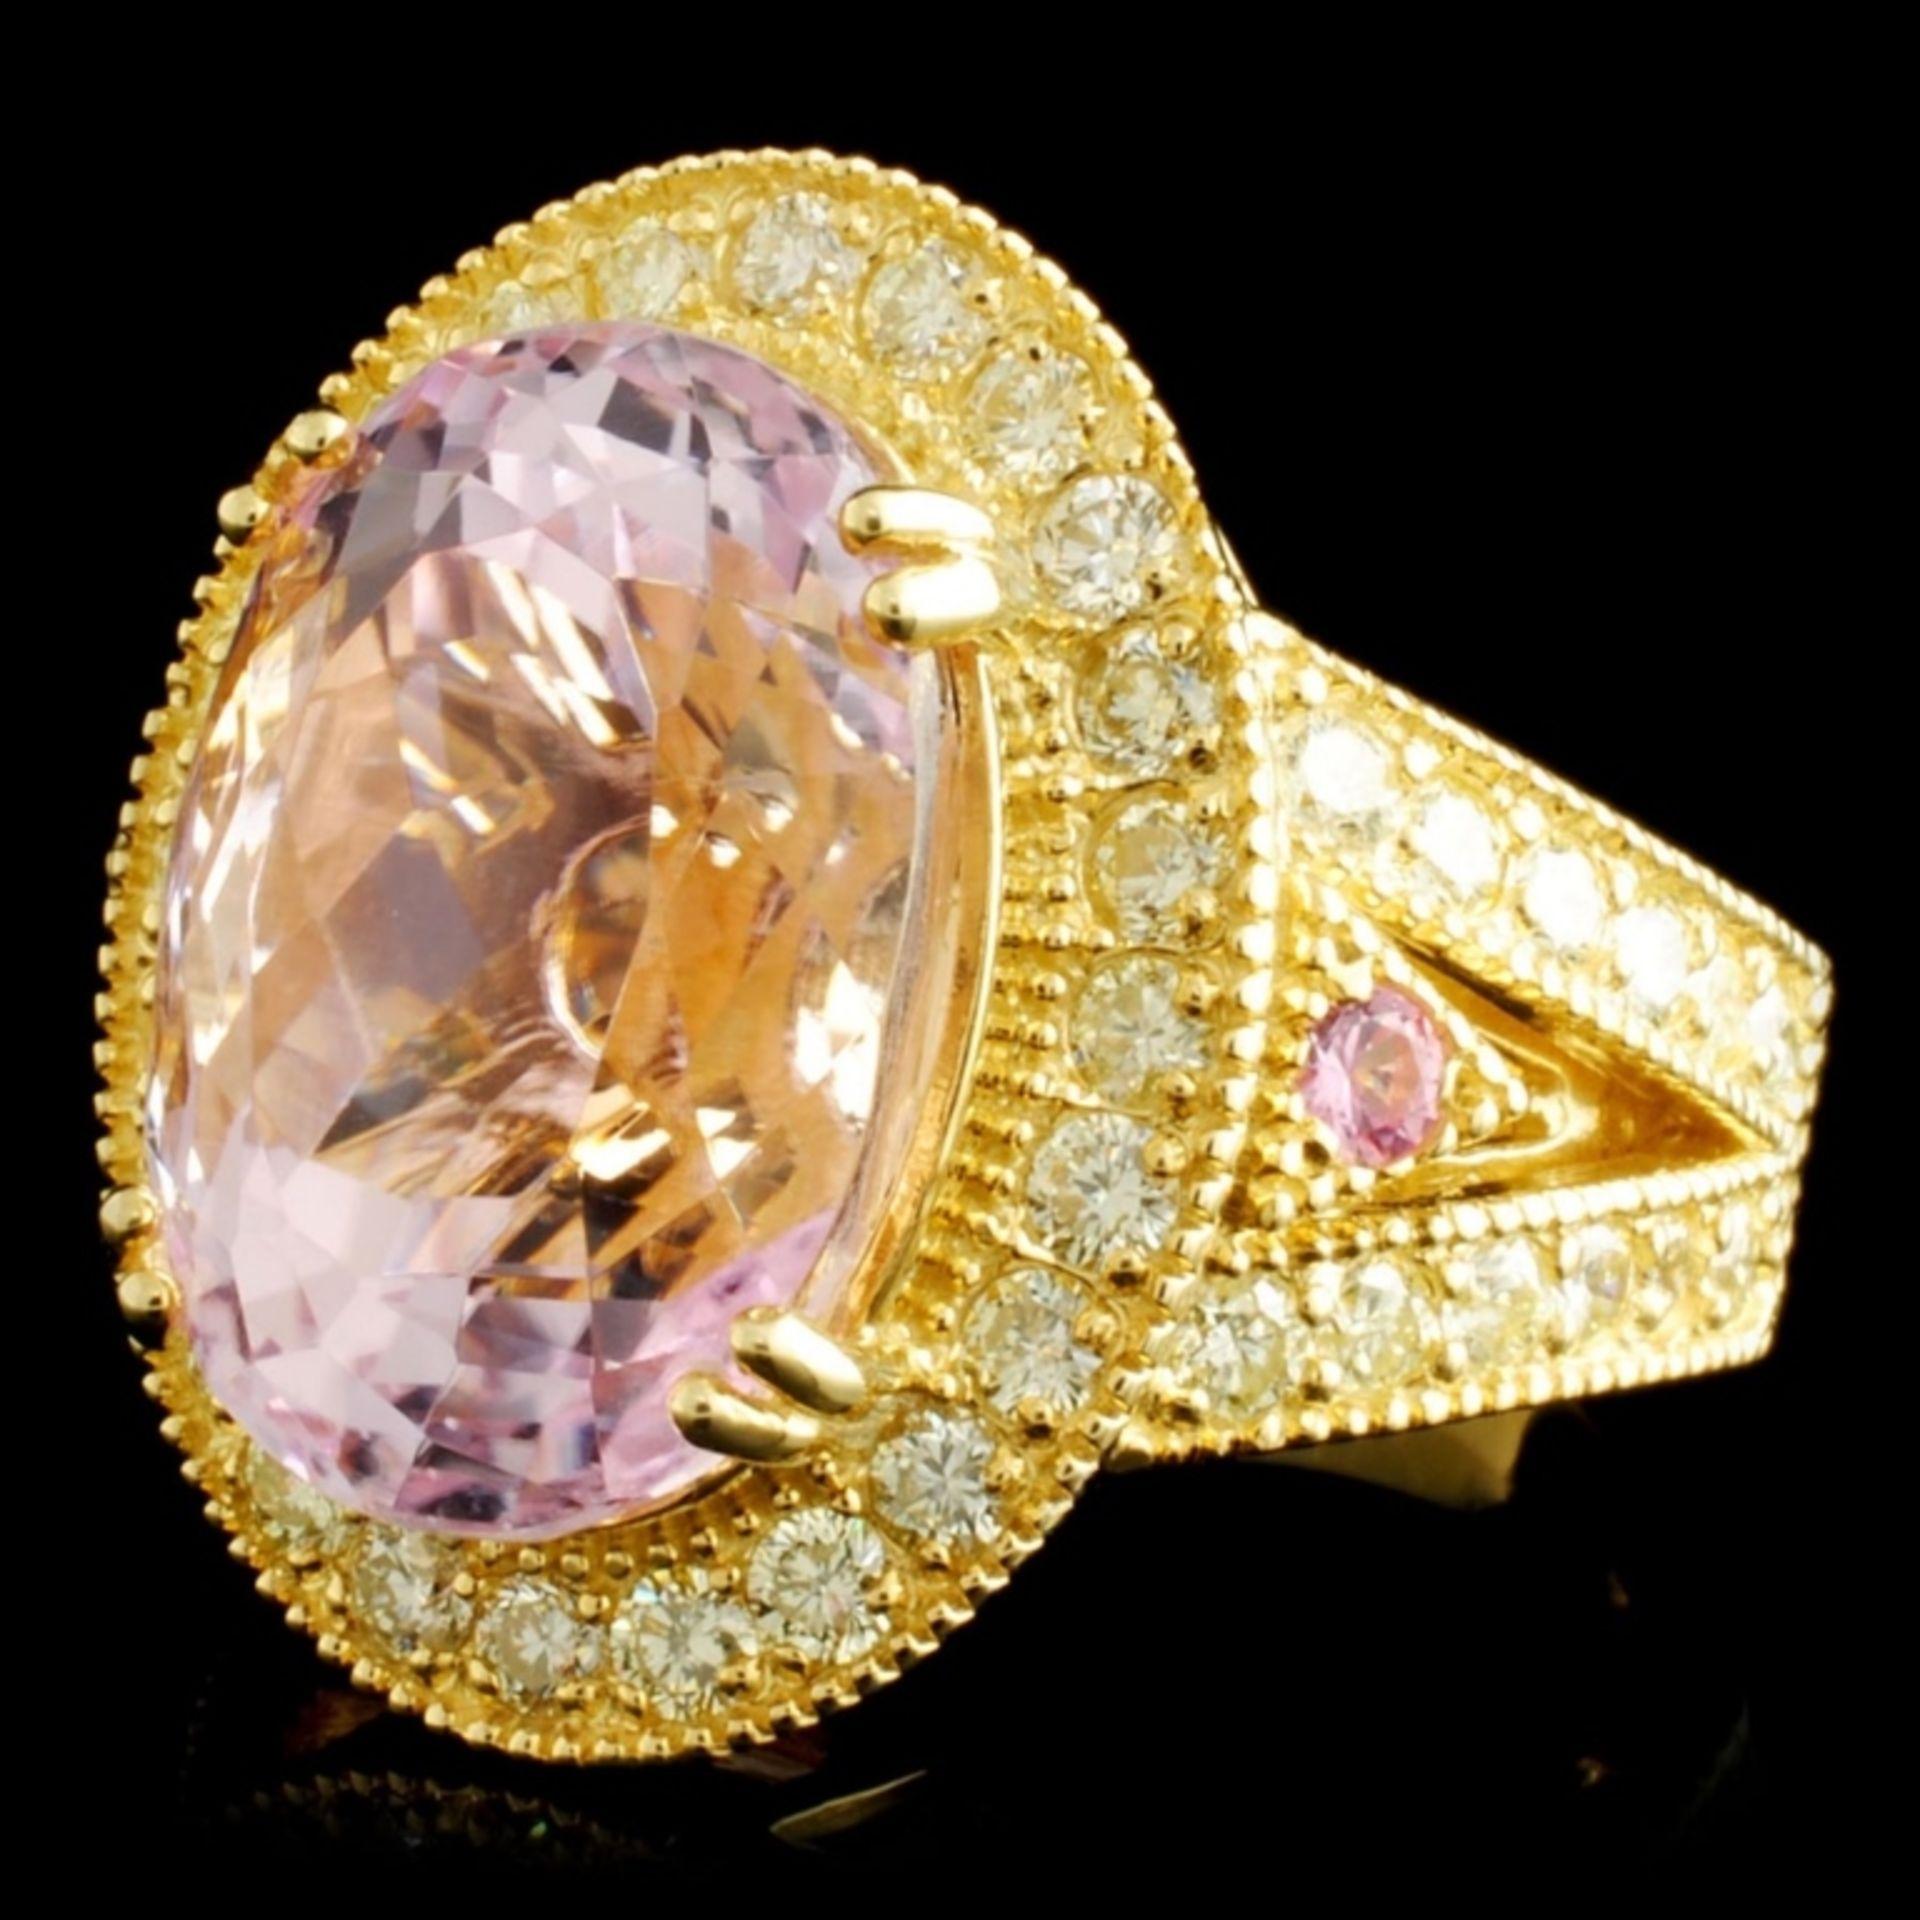 14K Gold 13.84ct Kunzite & 1.72ctw Diamond Ring - Image 2 of 5